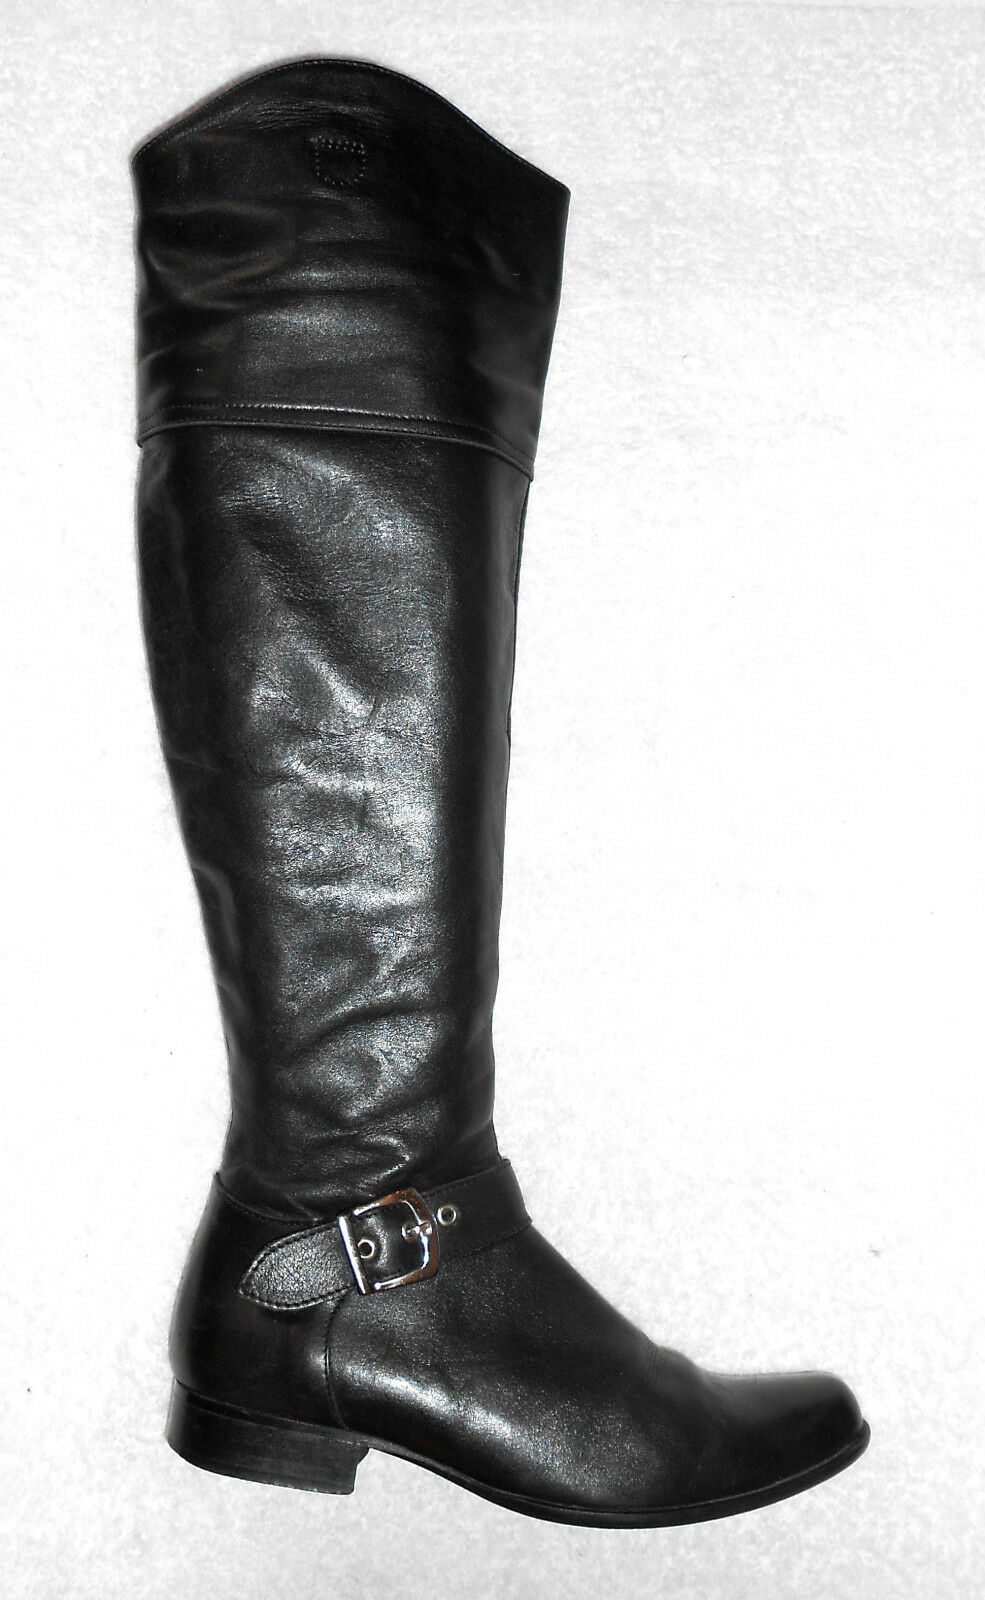 MINKA Design bottes plates zippées cuir noir P 37 TBE